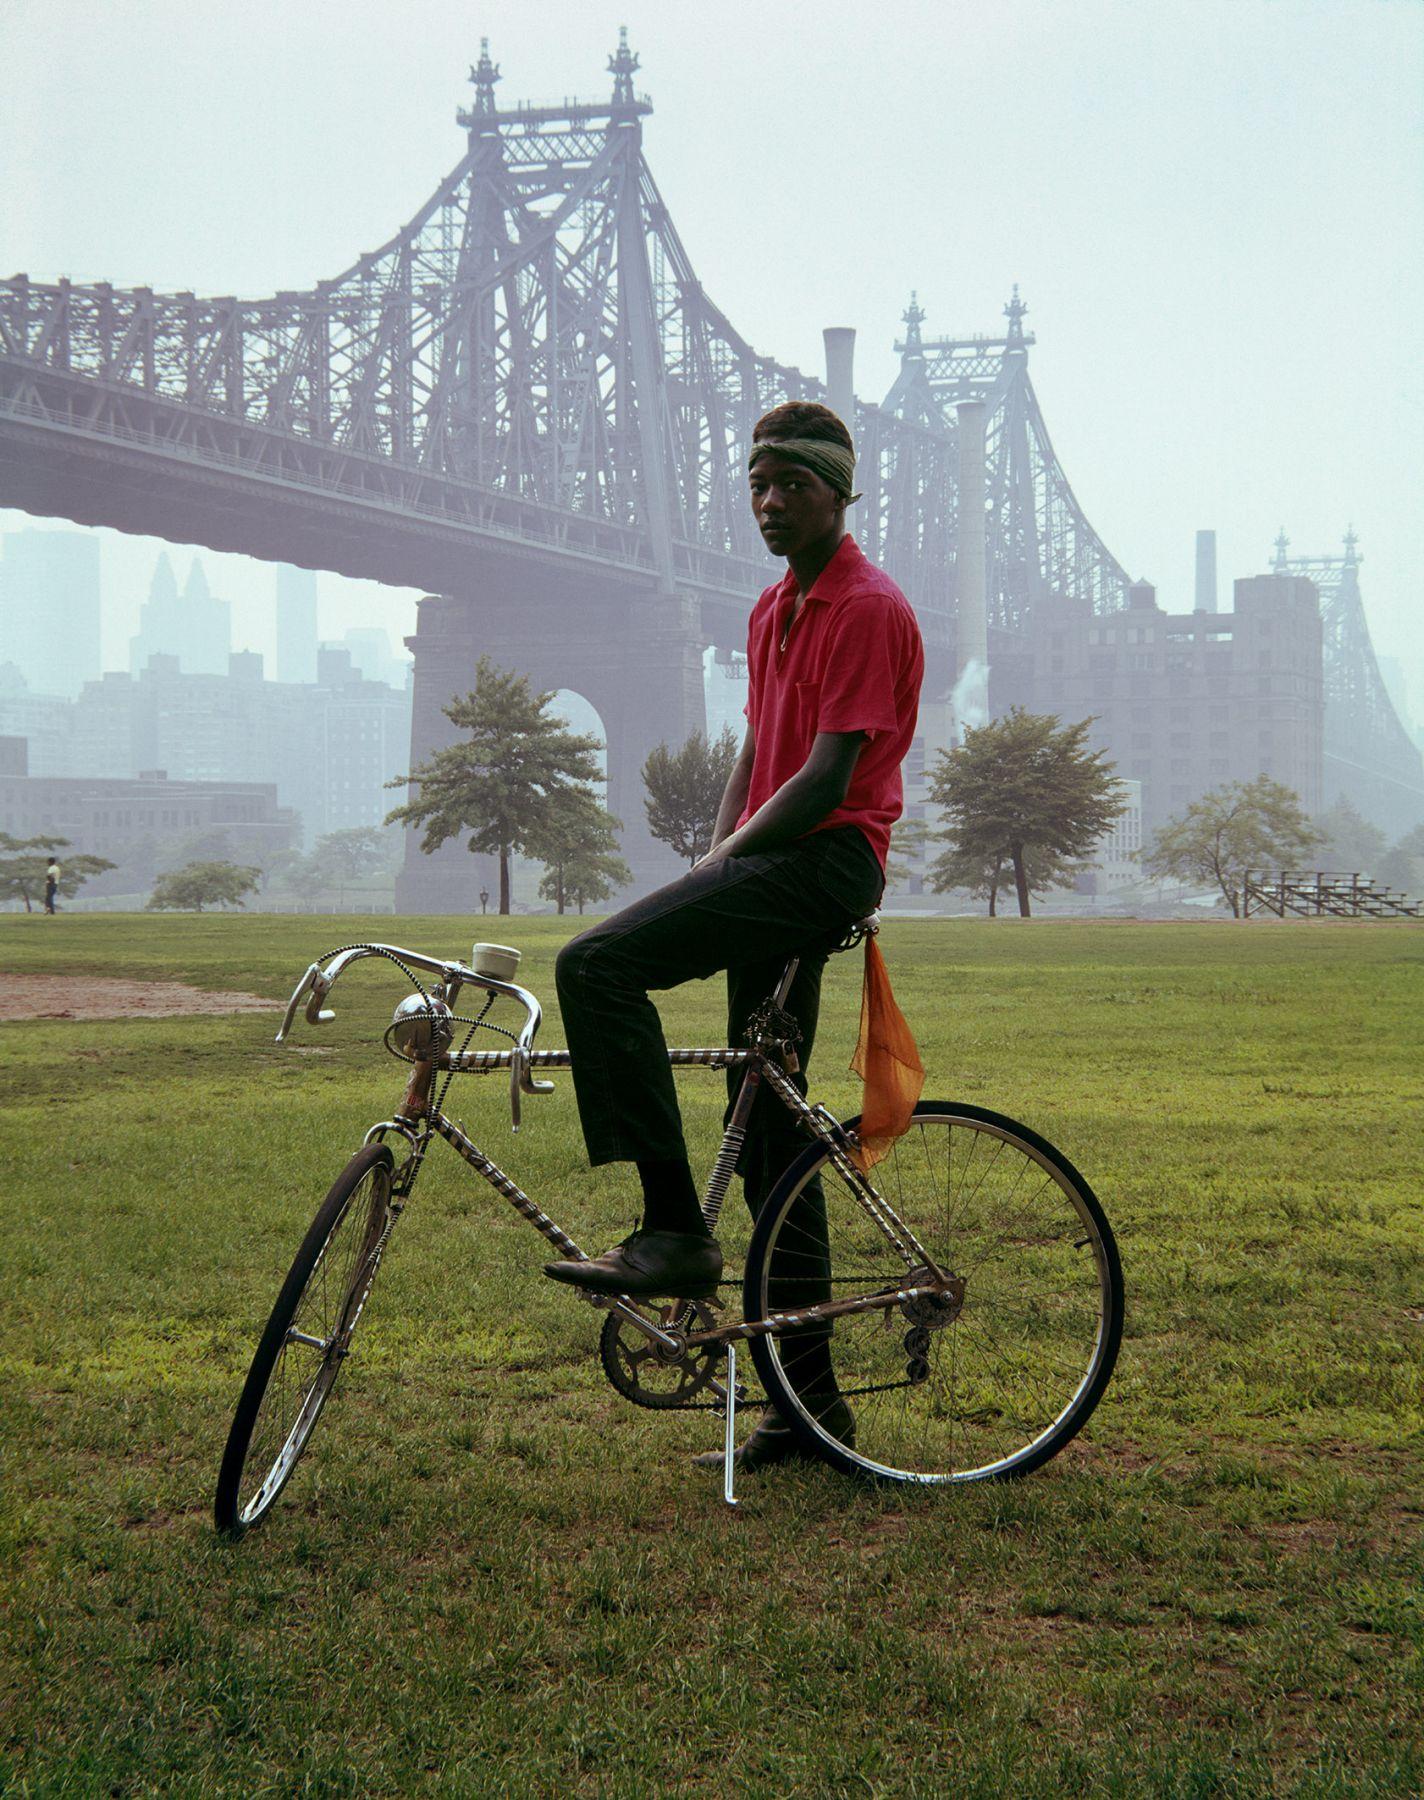 Queensboro Bridge, New York.1964, 20 x 16 inch dye transfer print